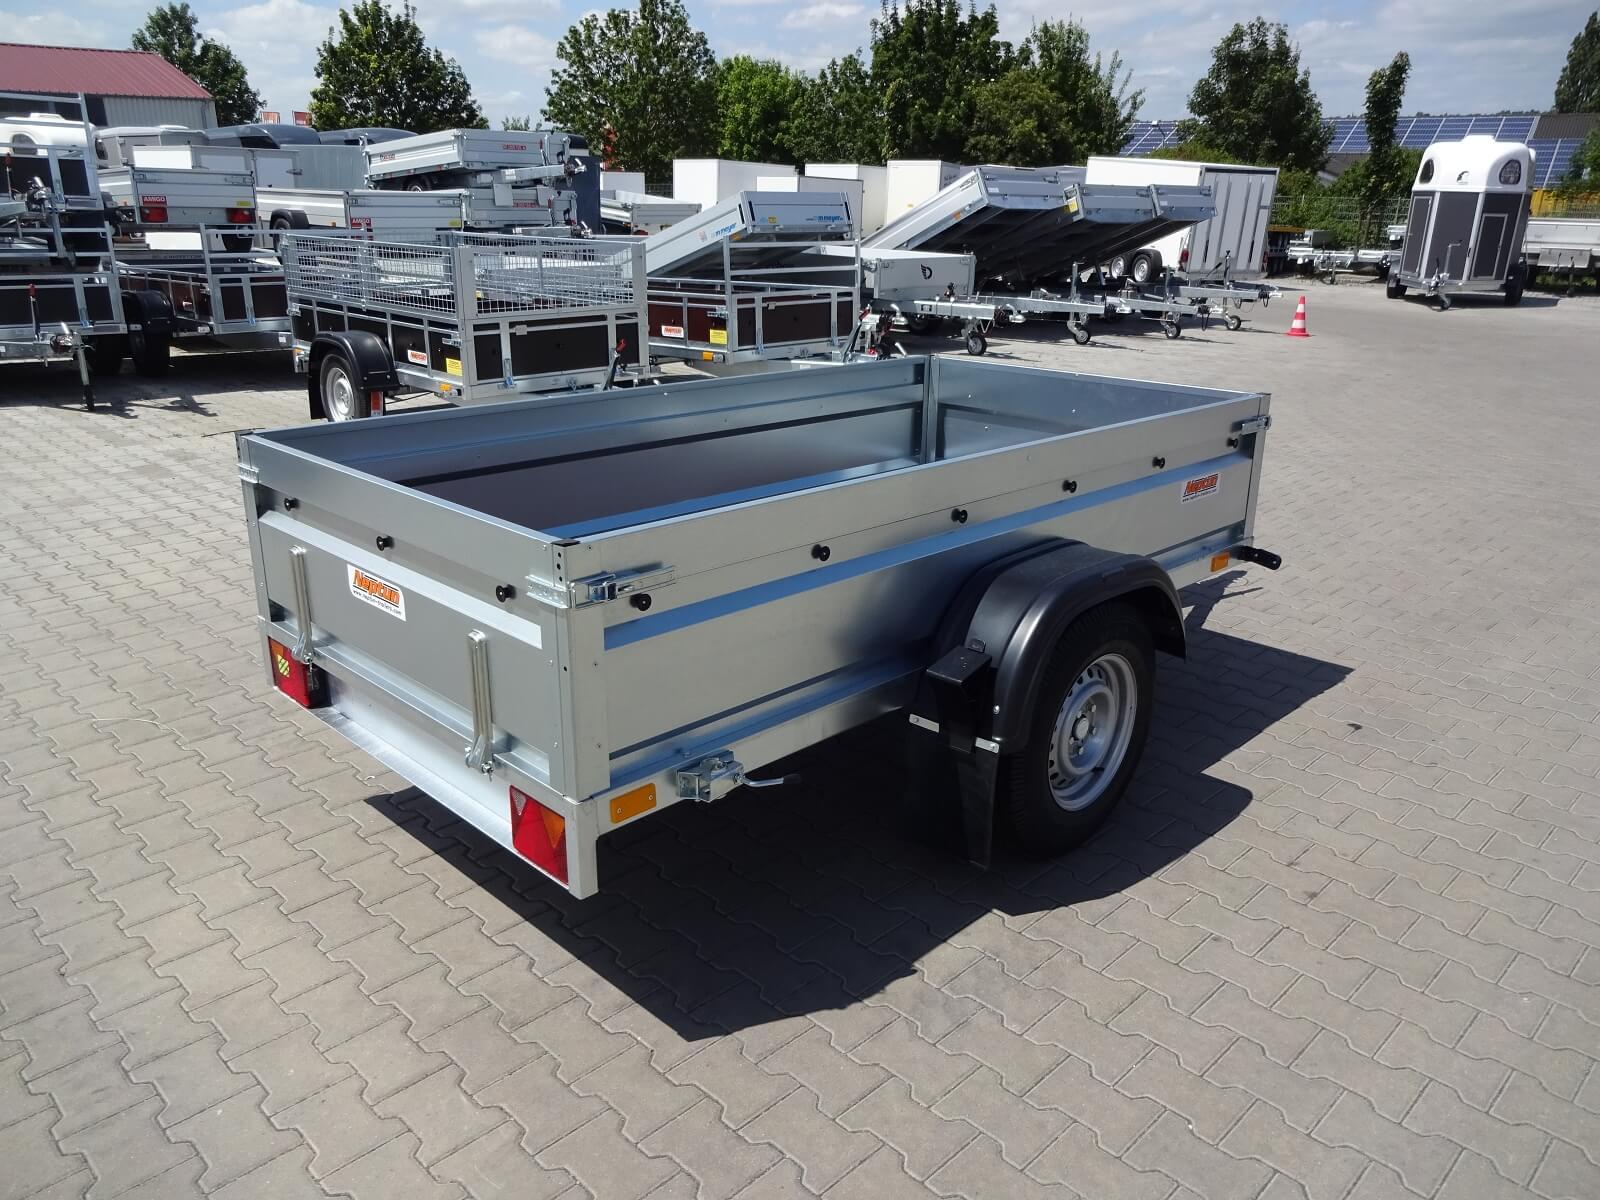 GN175 Neptun Pro 2,53x1,29m 1600 kg